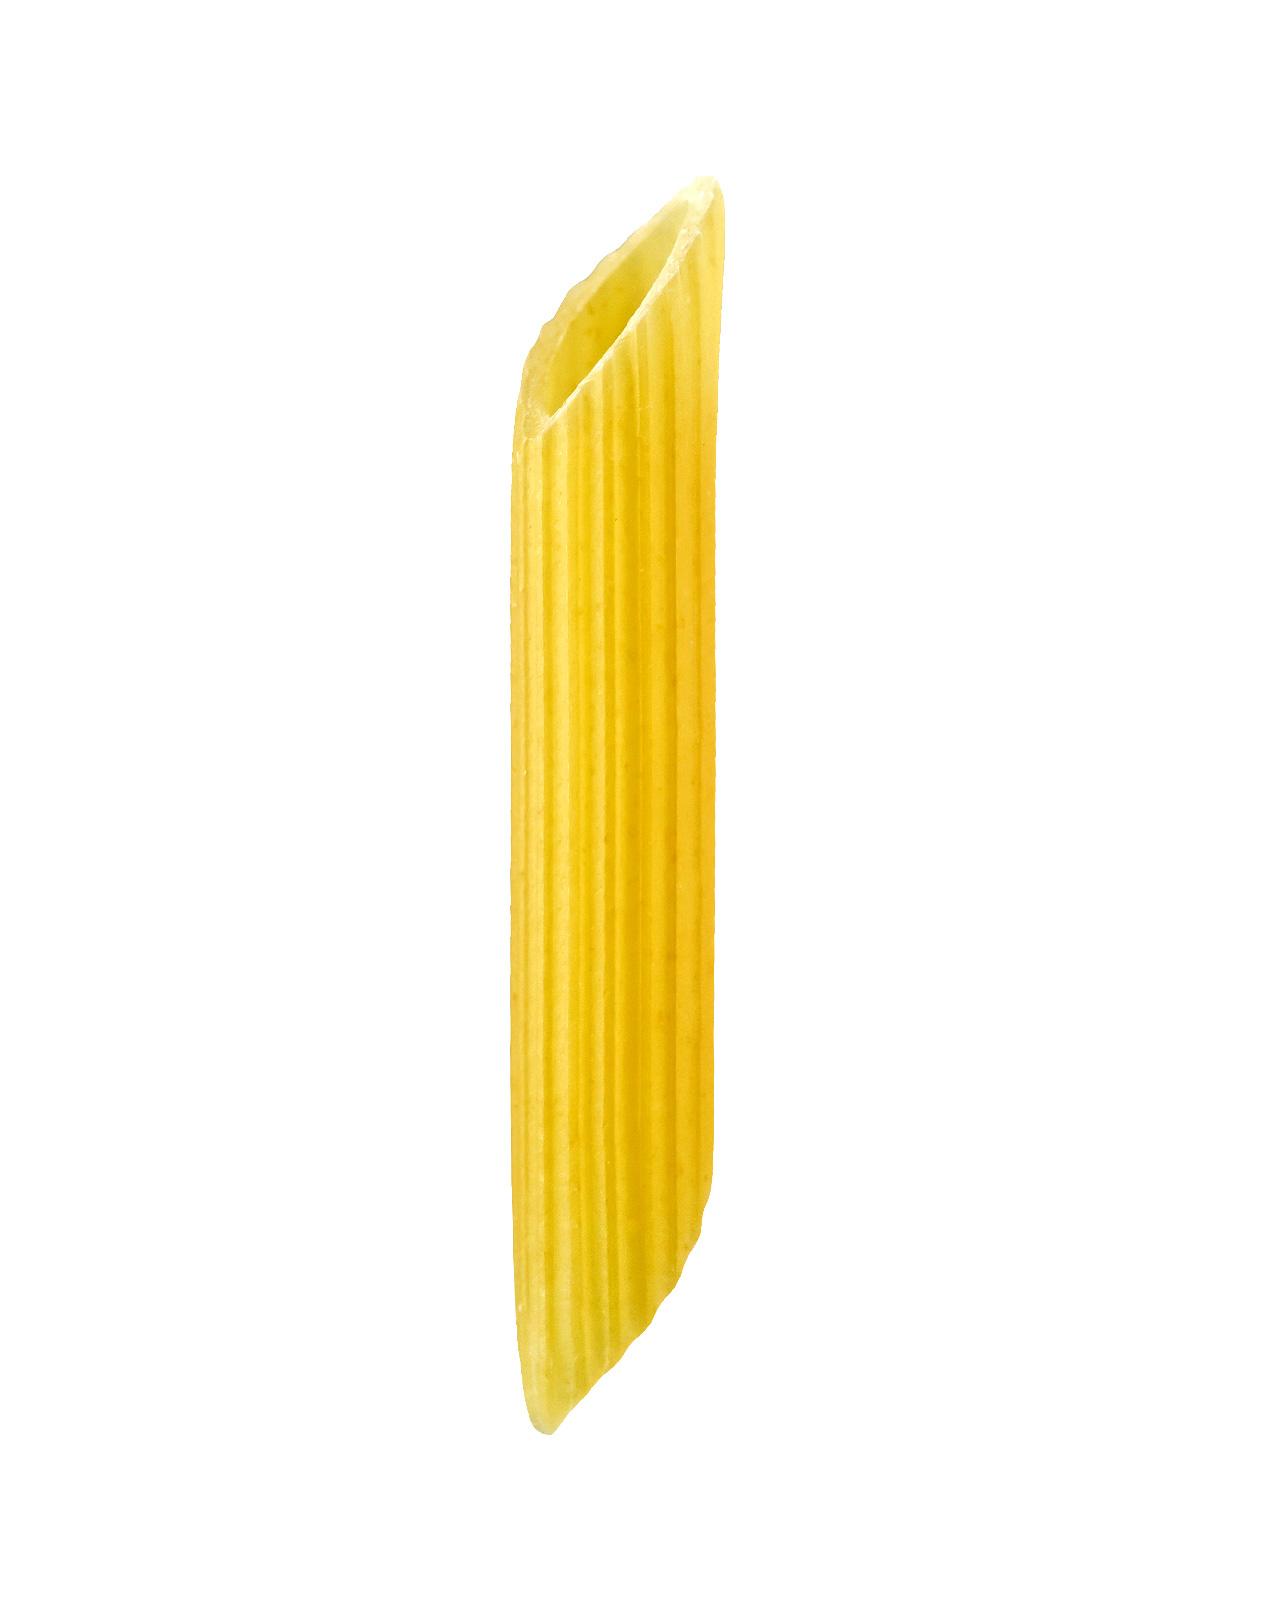 Penne Rigate n° 48